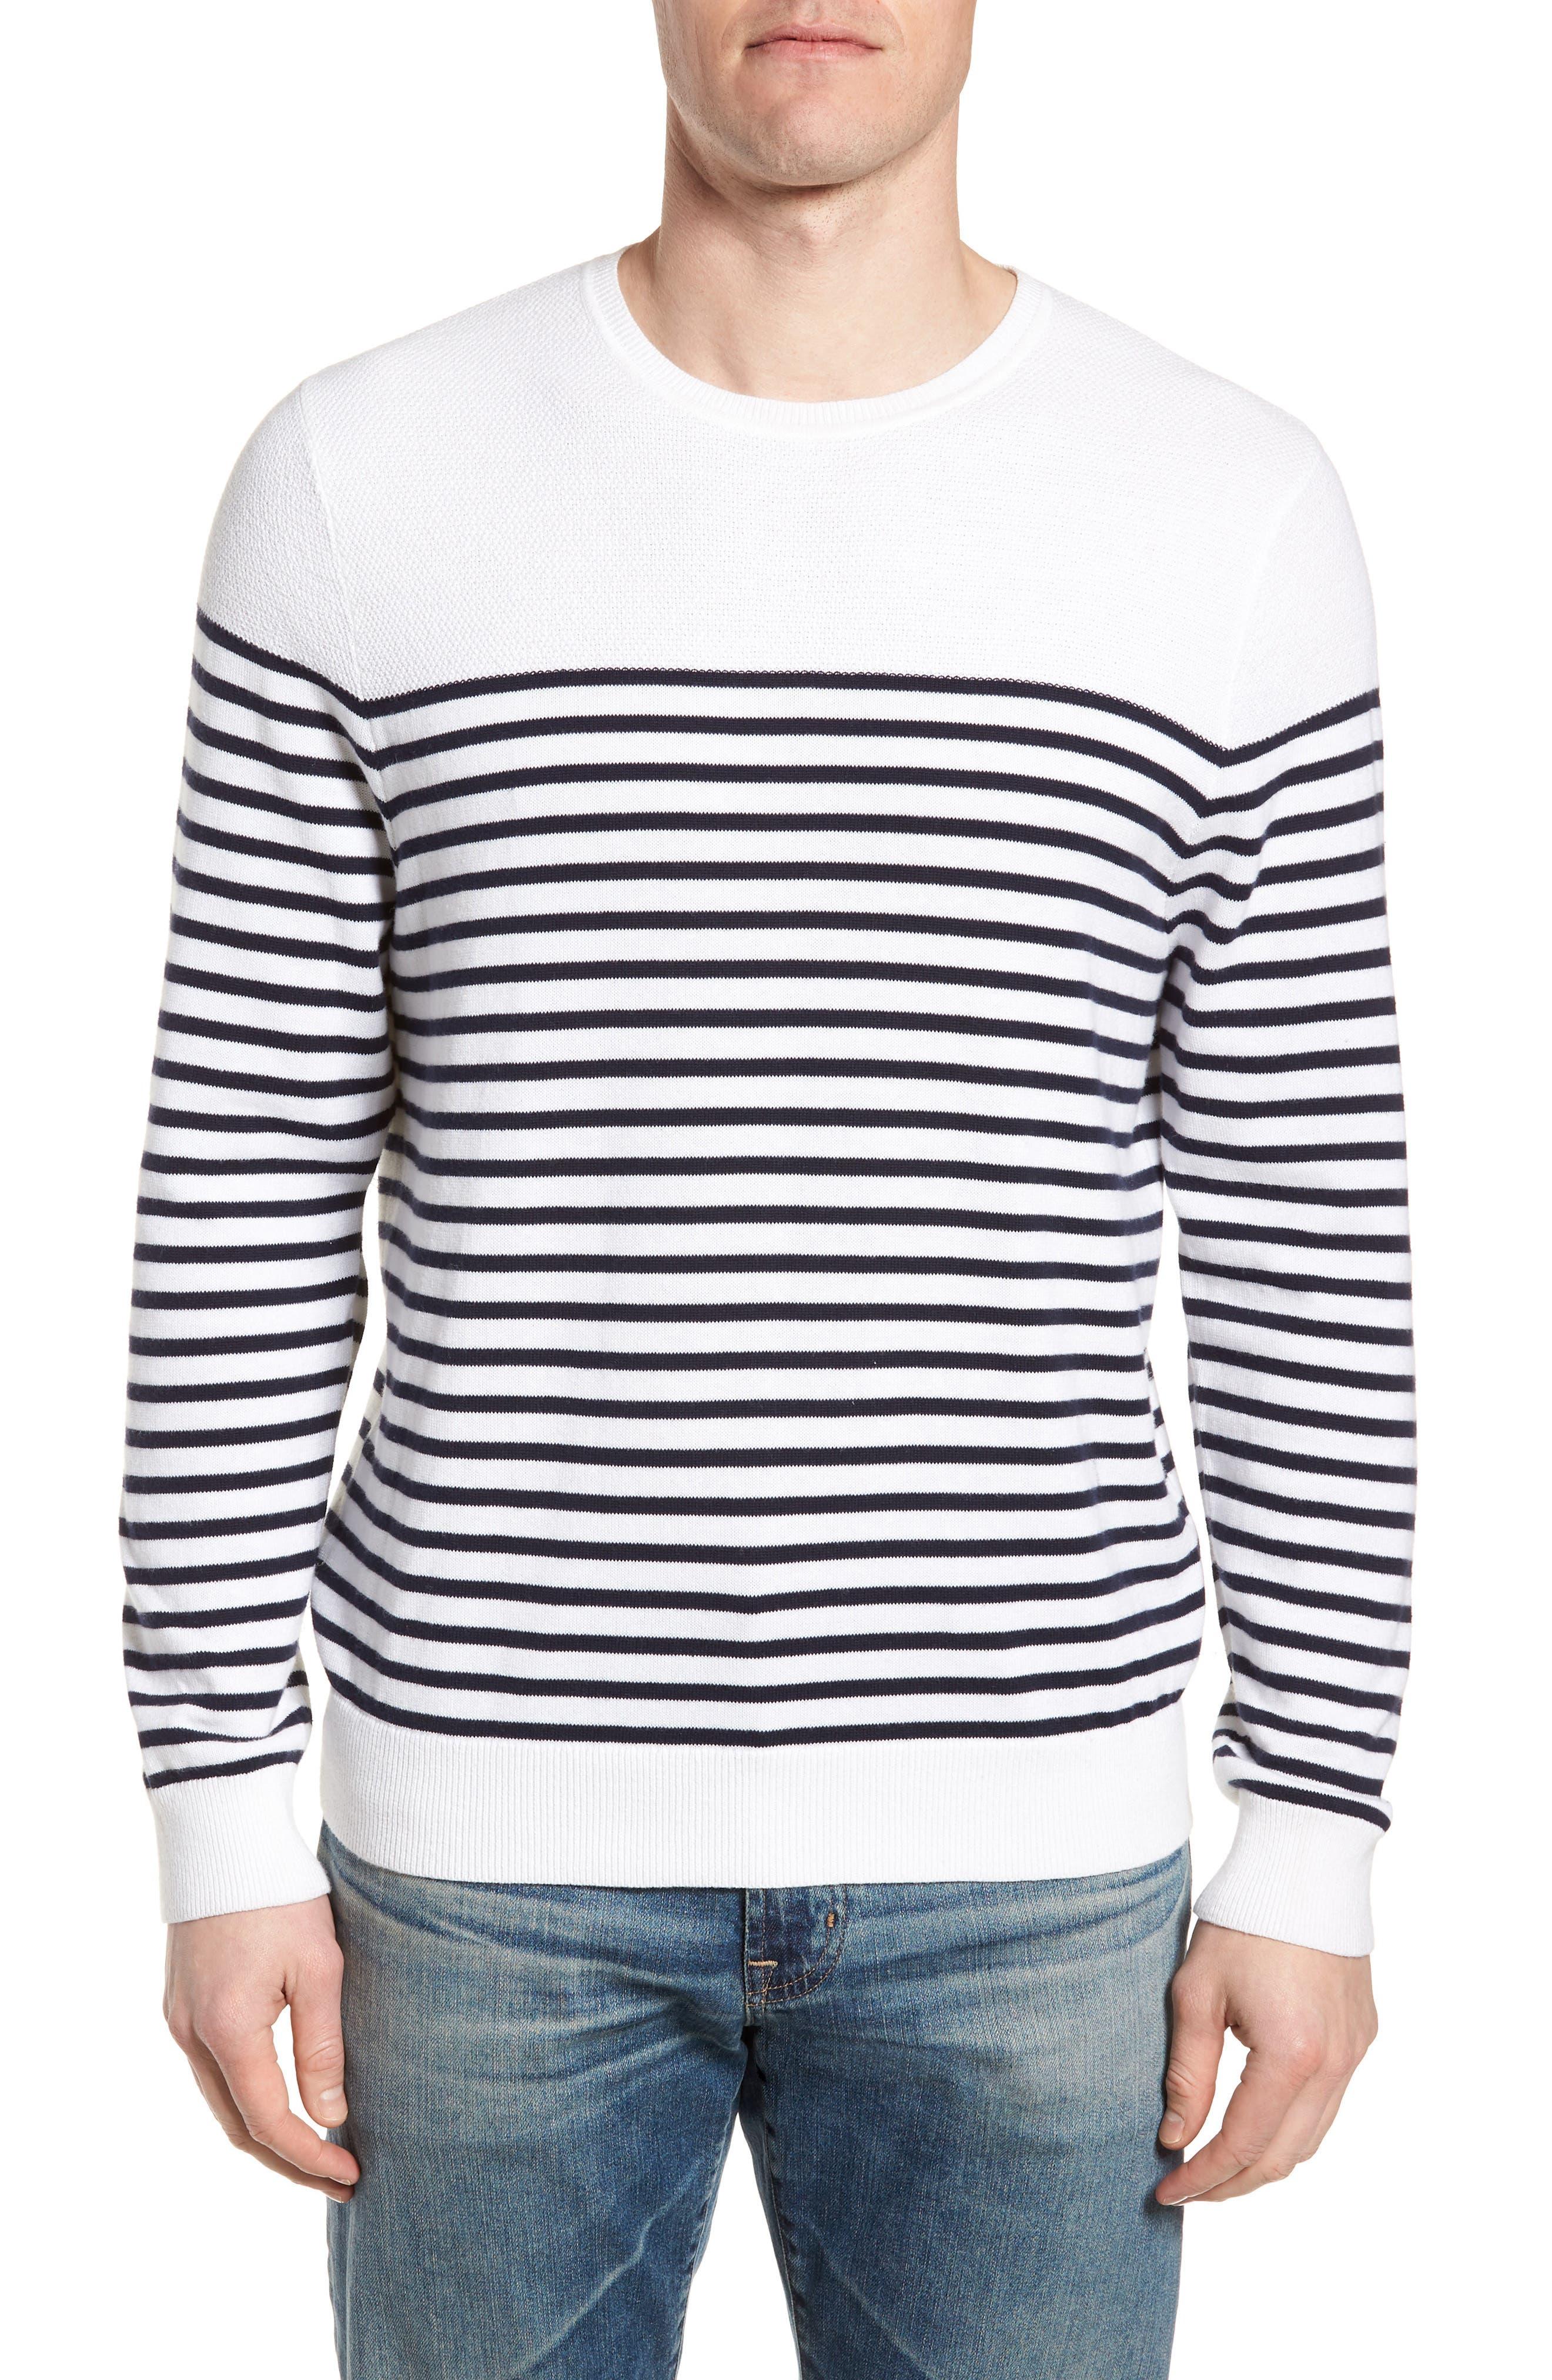 Breton Stripe Sweater,                             Main thumbnail 1, color,                             White Navy Stripe